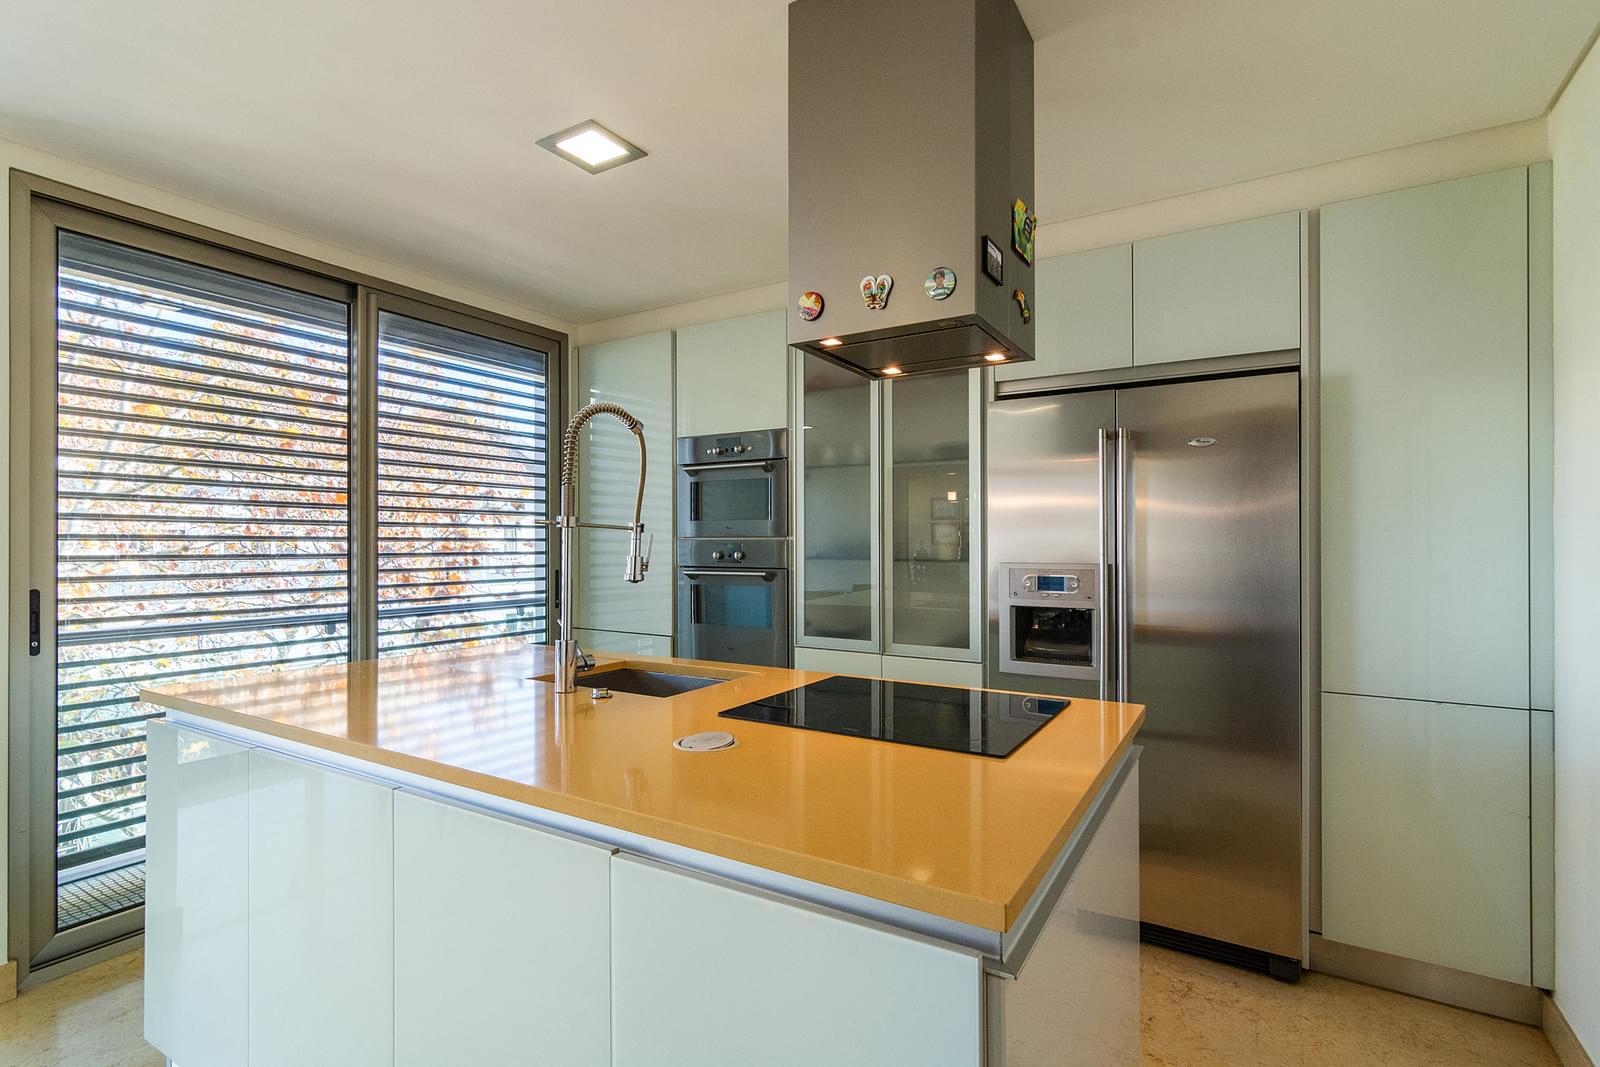 pf14588-apartamento-t5-lisboa-1403bb3a-437e-43be-a43b-bf137d2e44d7